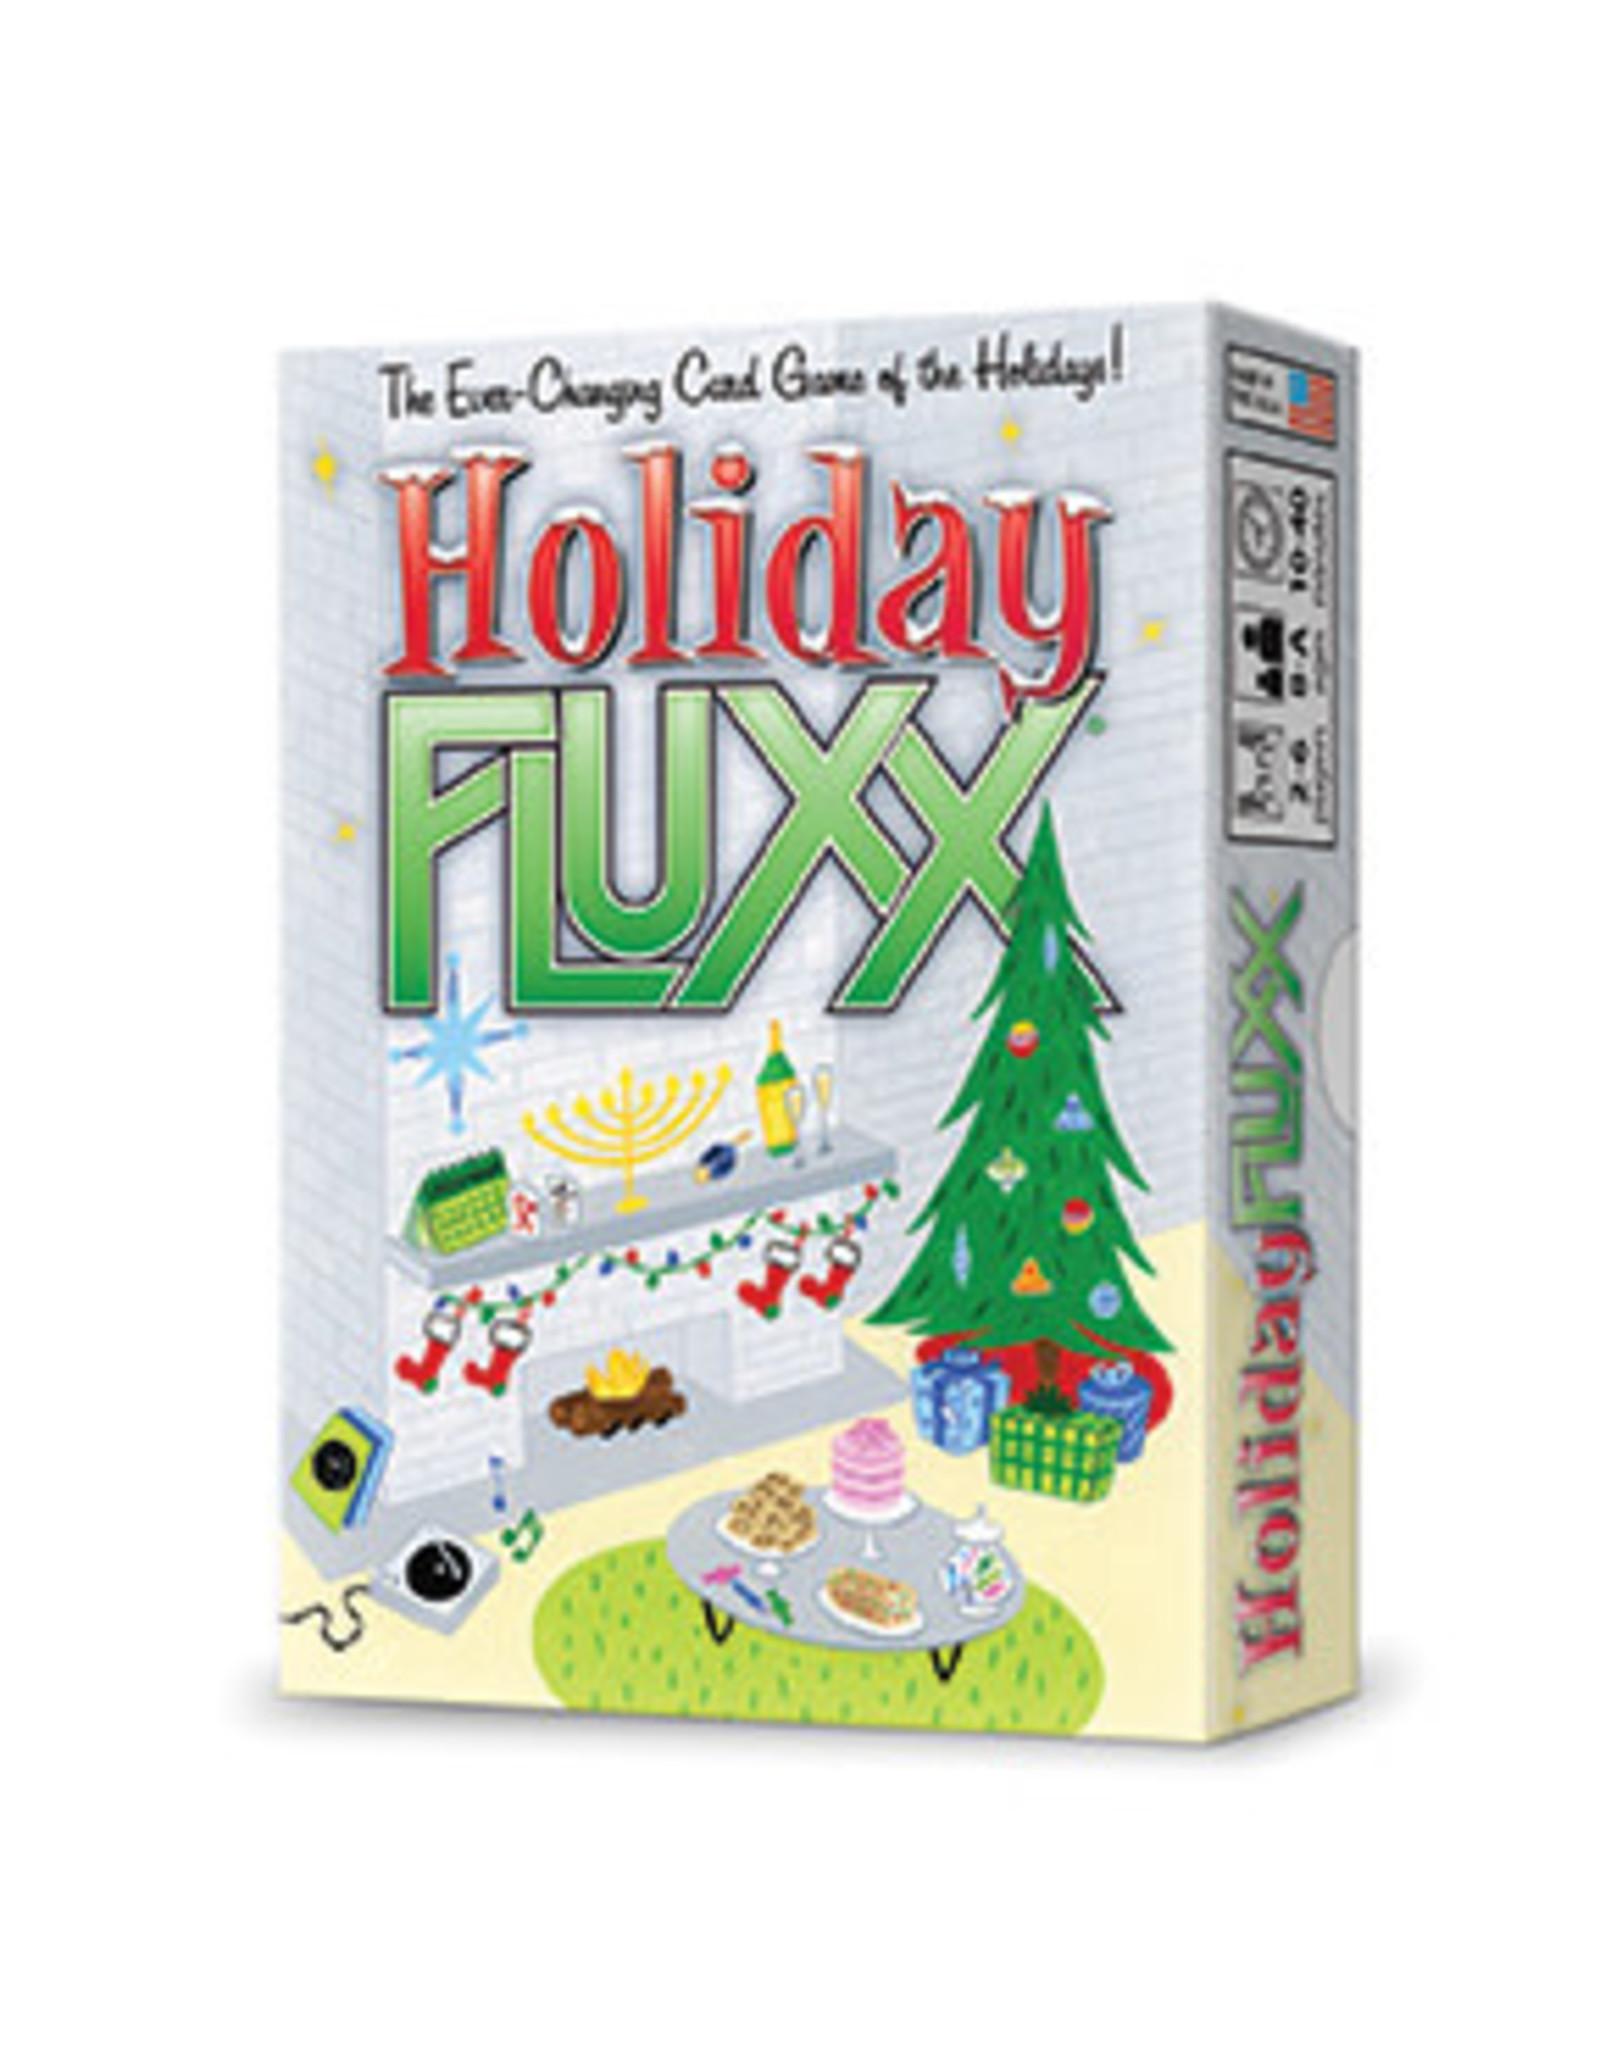 Looney Labs Fluxx - Holiday Fluxx